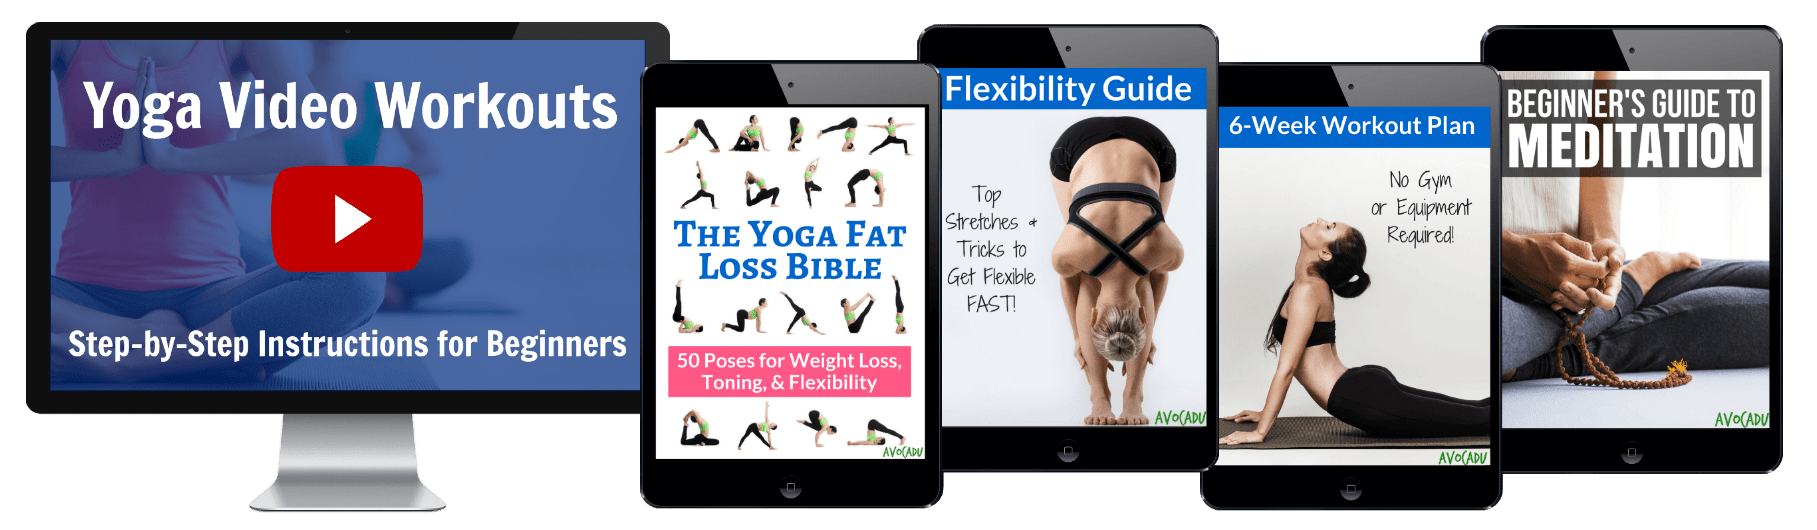 Yoga Fat Loss Bible by Avocadu